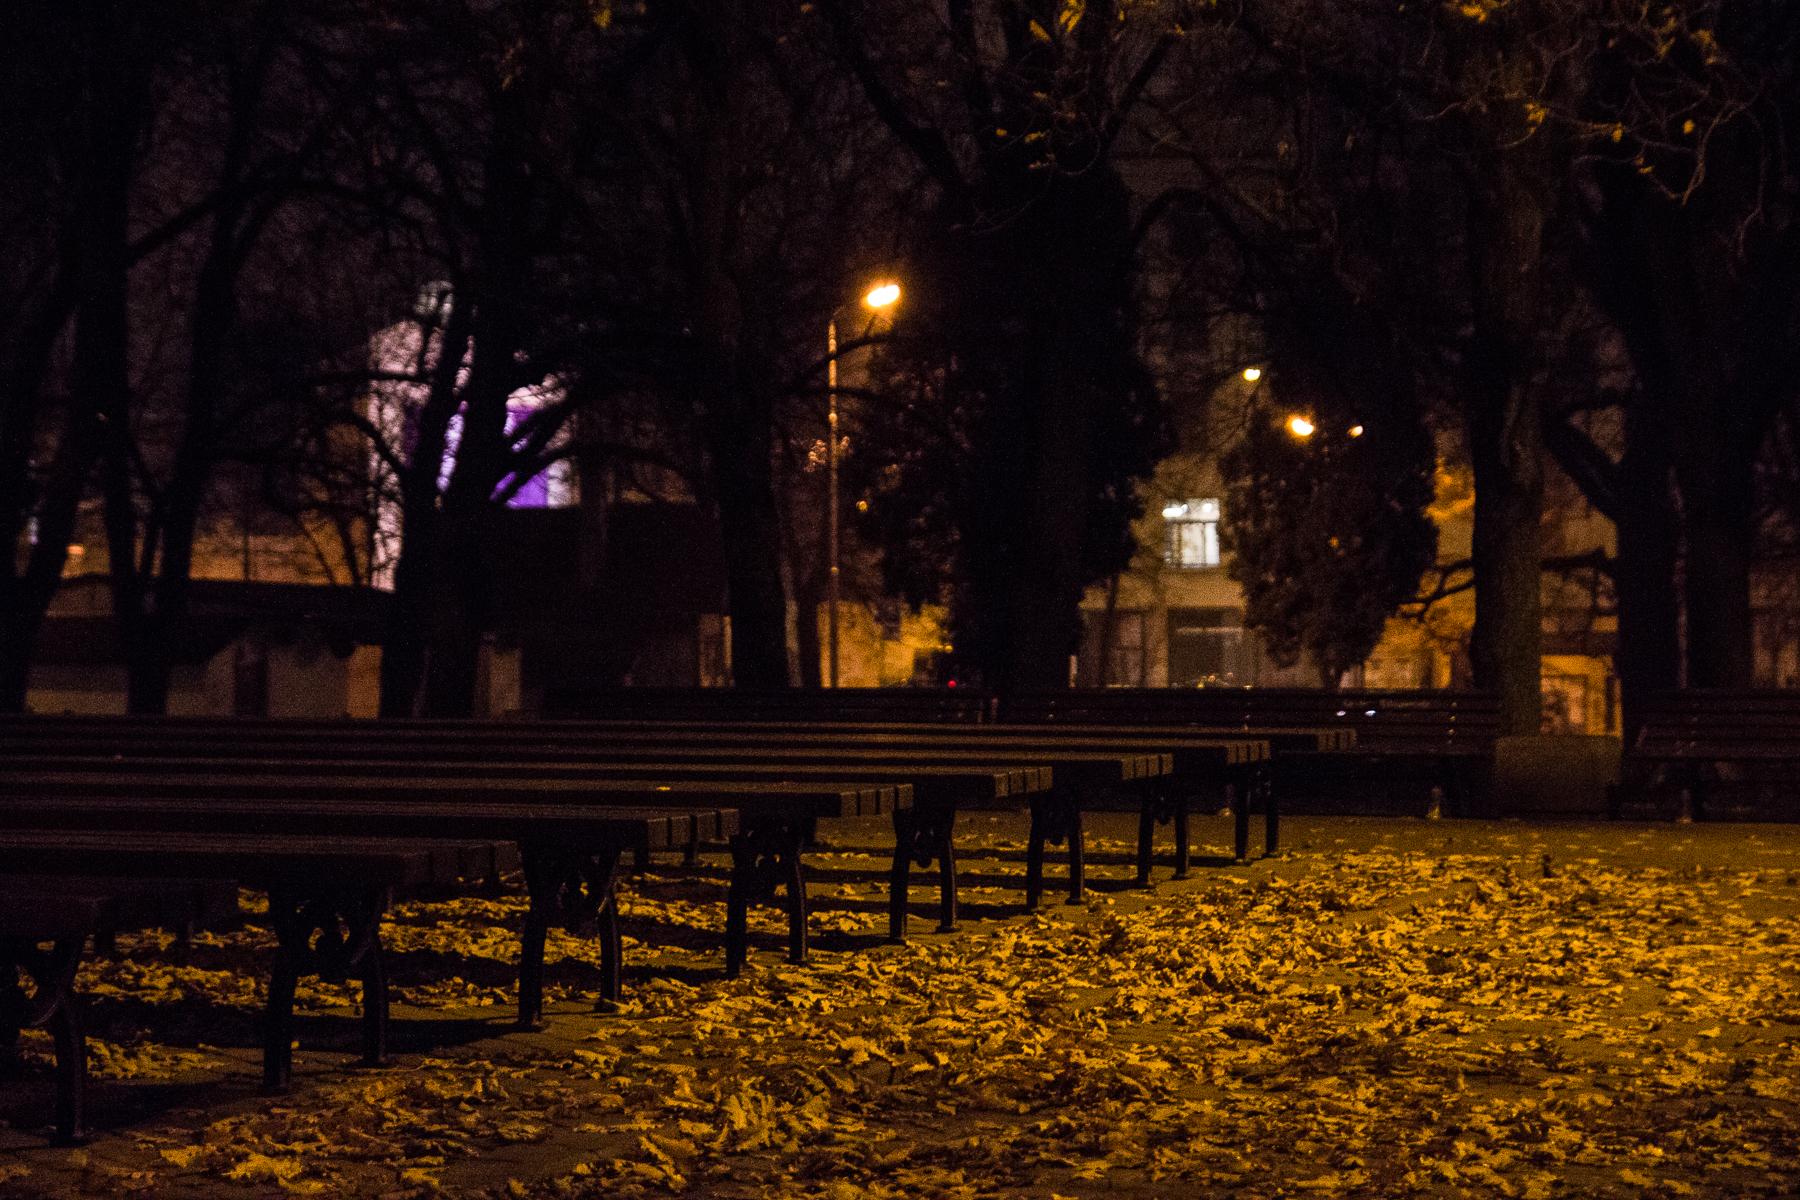 Night At Park Via @Atisgailis